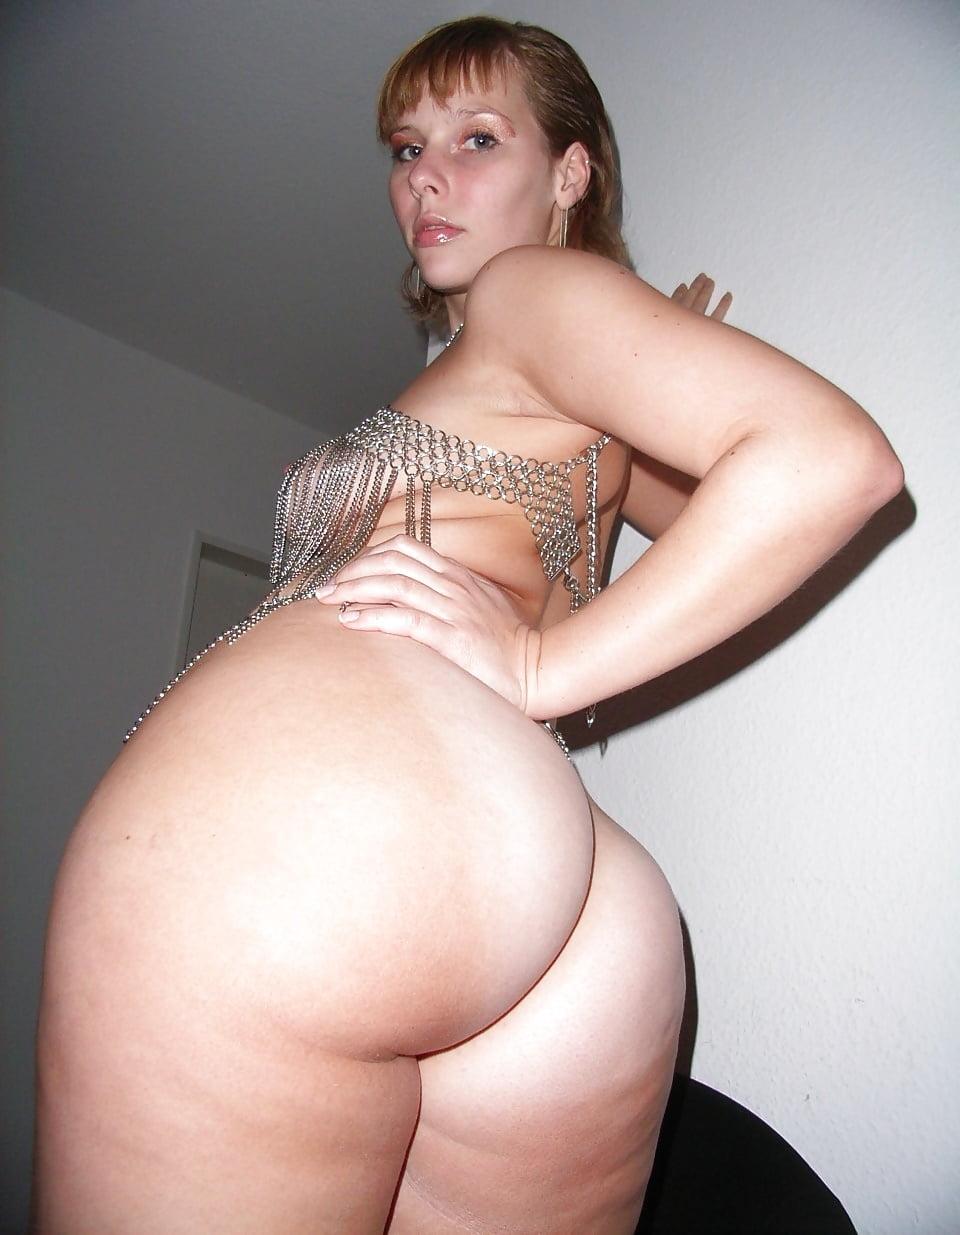 Cherie pics ass — pic 4